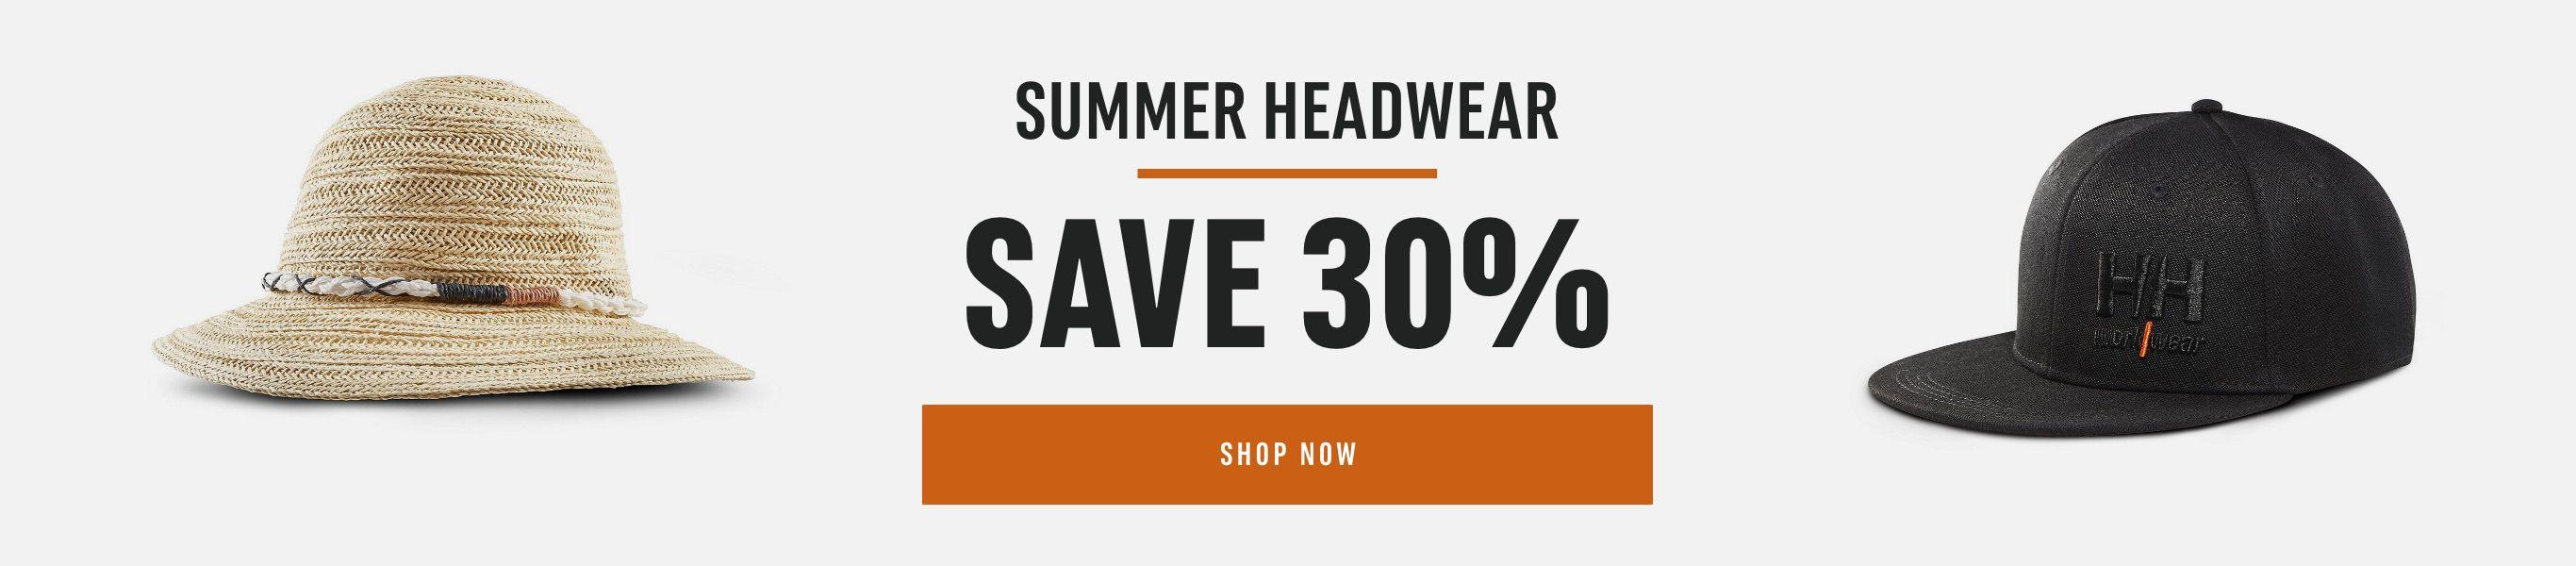 Summer Headwear: Save 30%